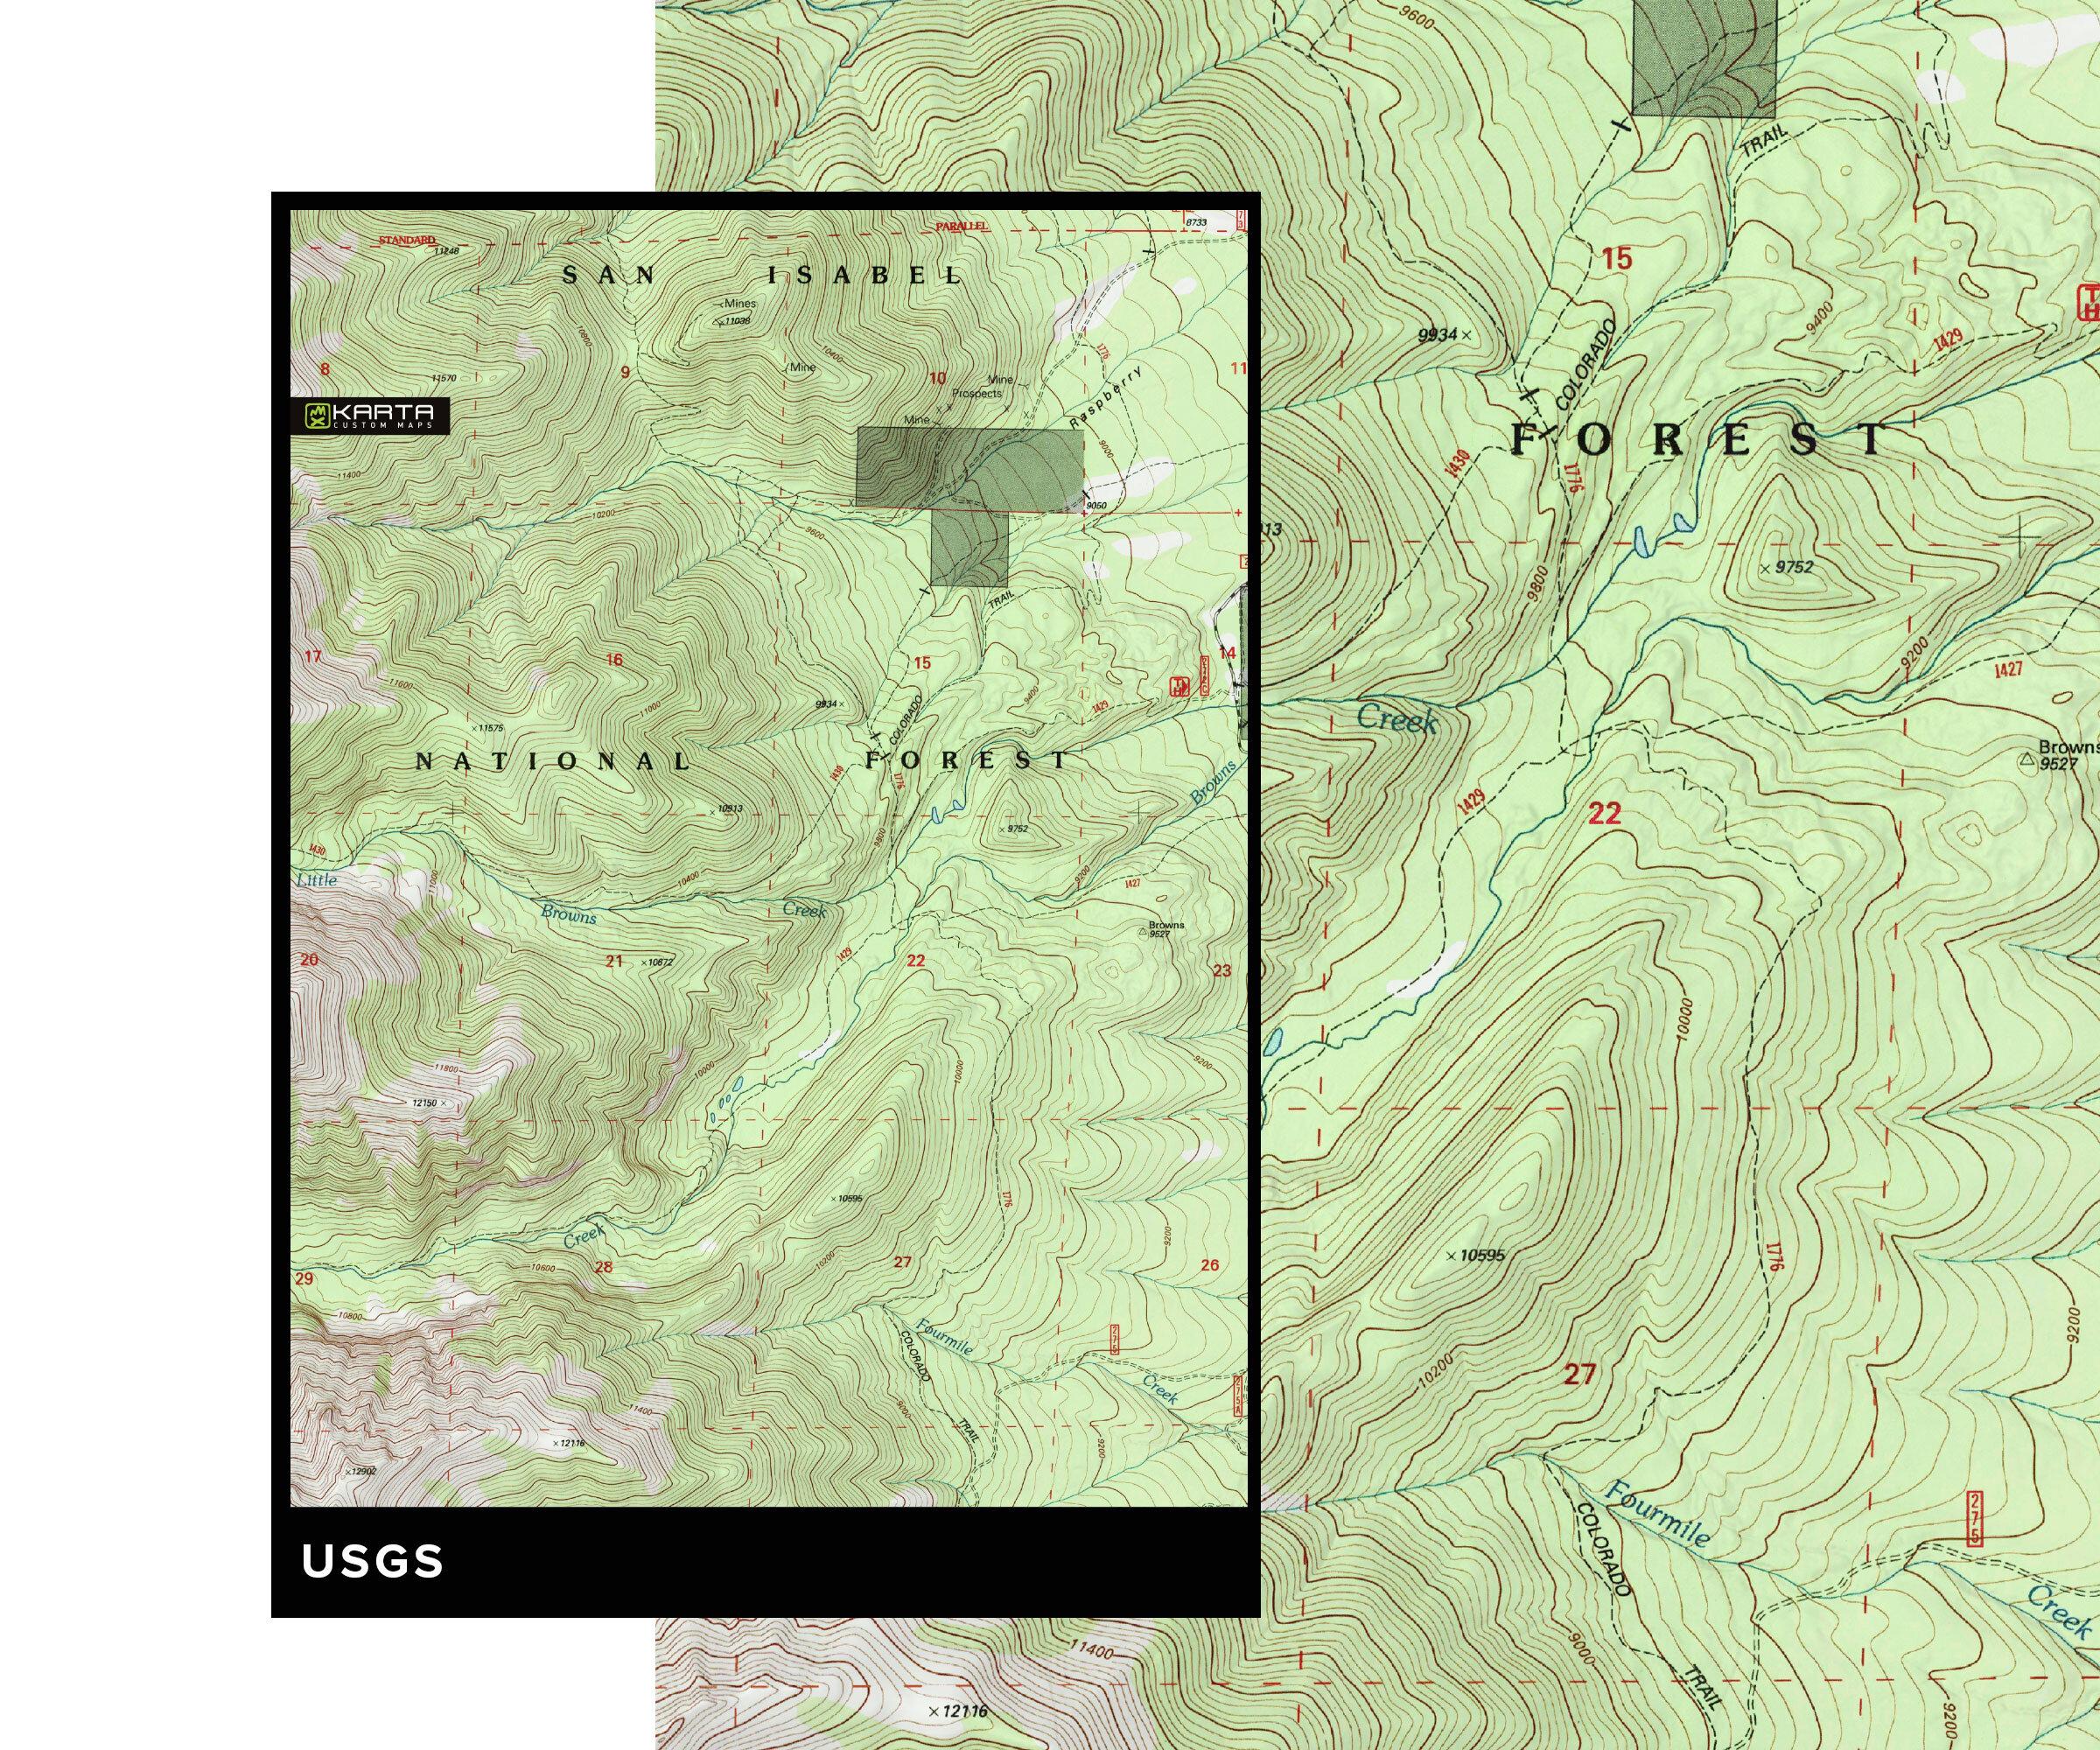 KARTA_CLASSIC_USGS1.jpg